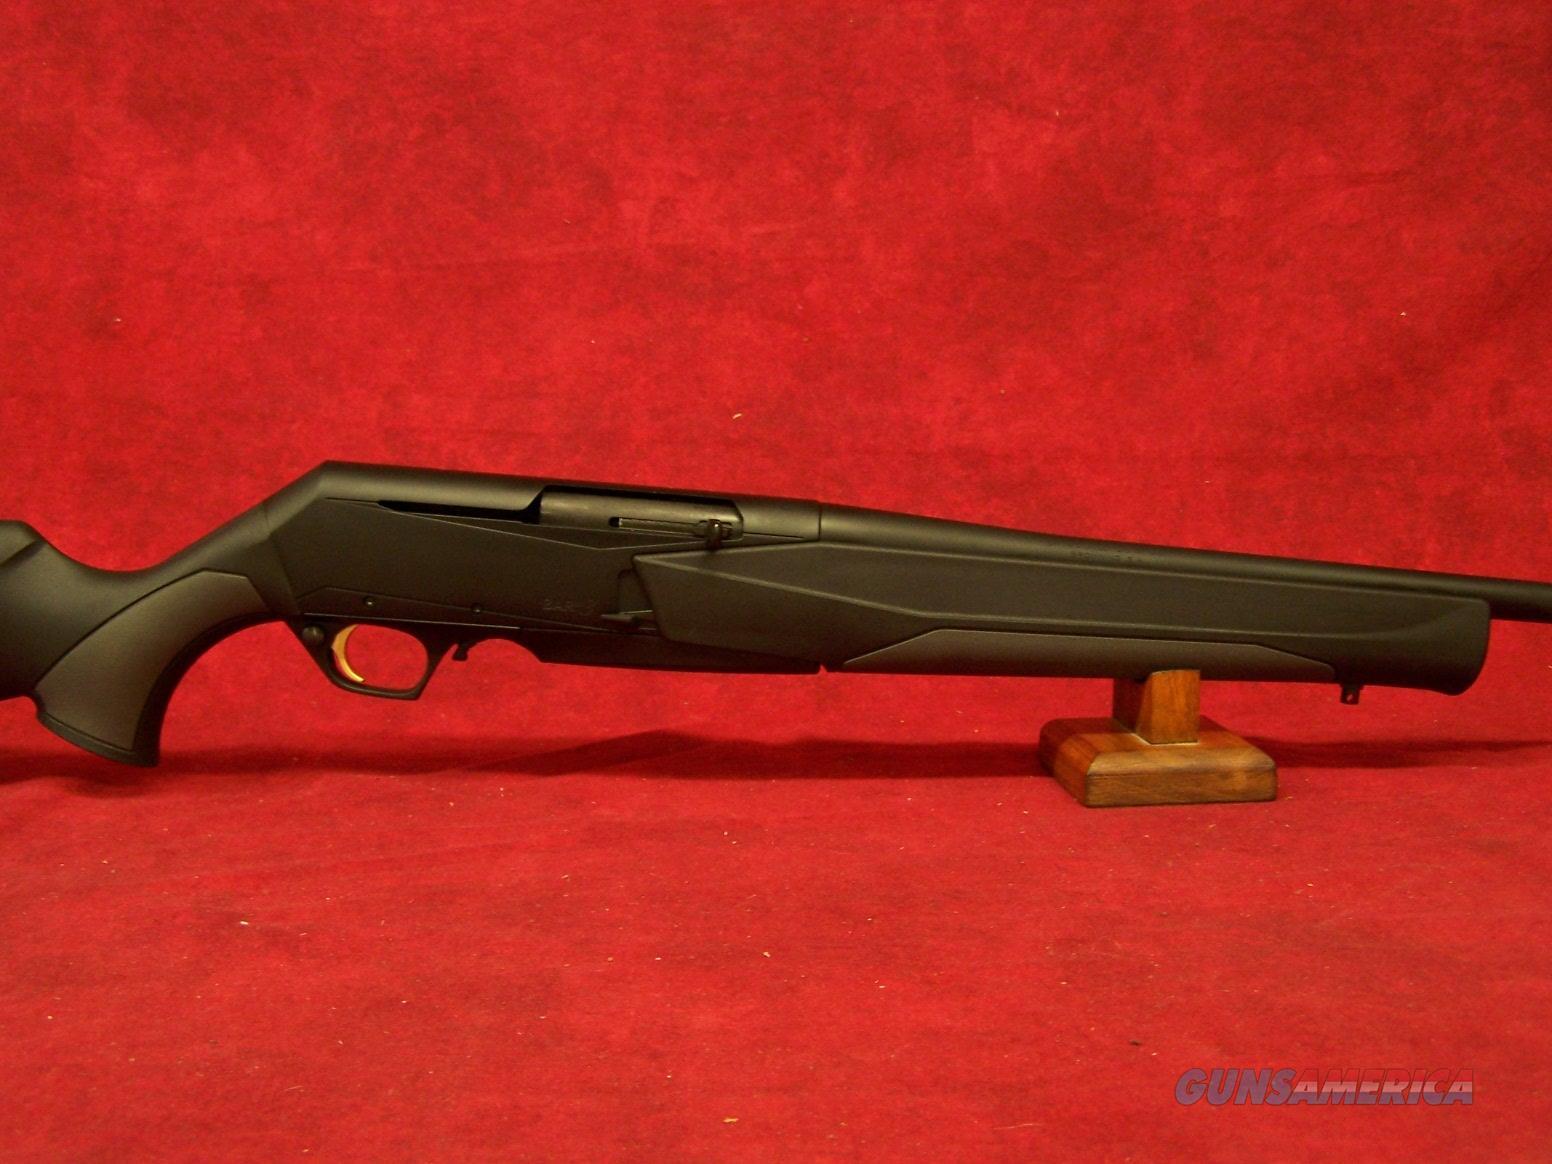 "Browning BAR MK3 Stalker .270 22"" Barrel (031048224)  Guns > Rifles > Browning Rifles > Semi Auto > Hunting"